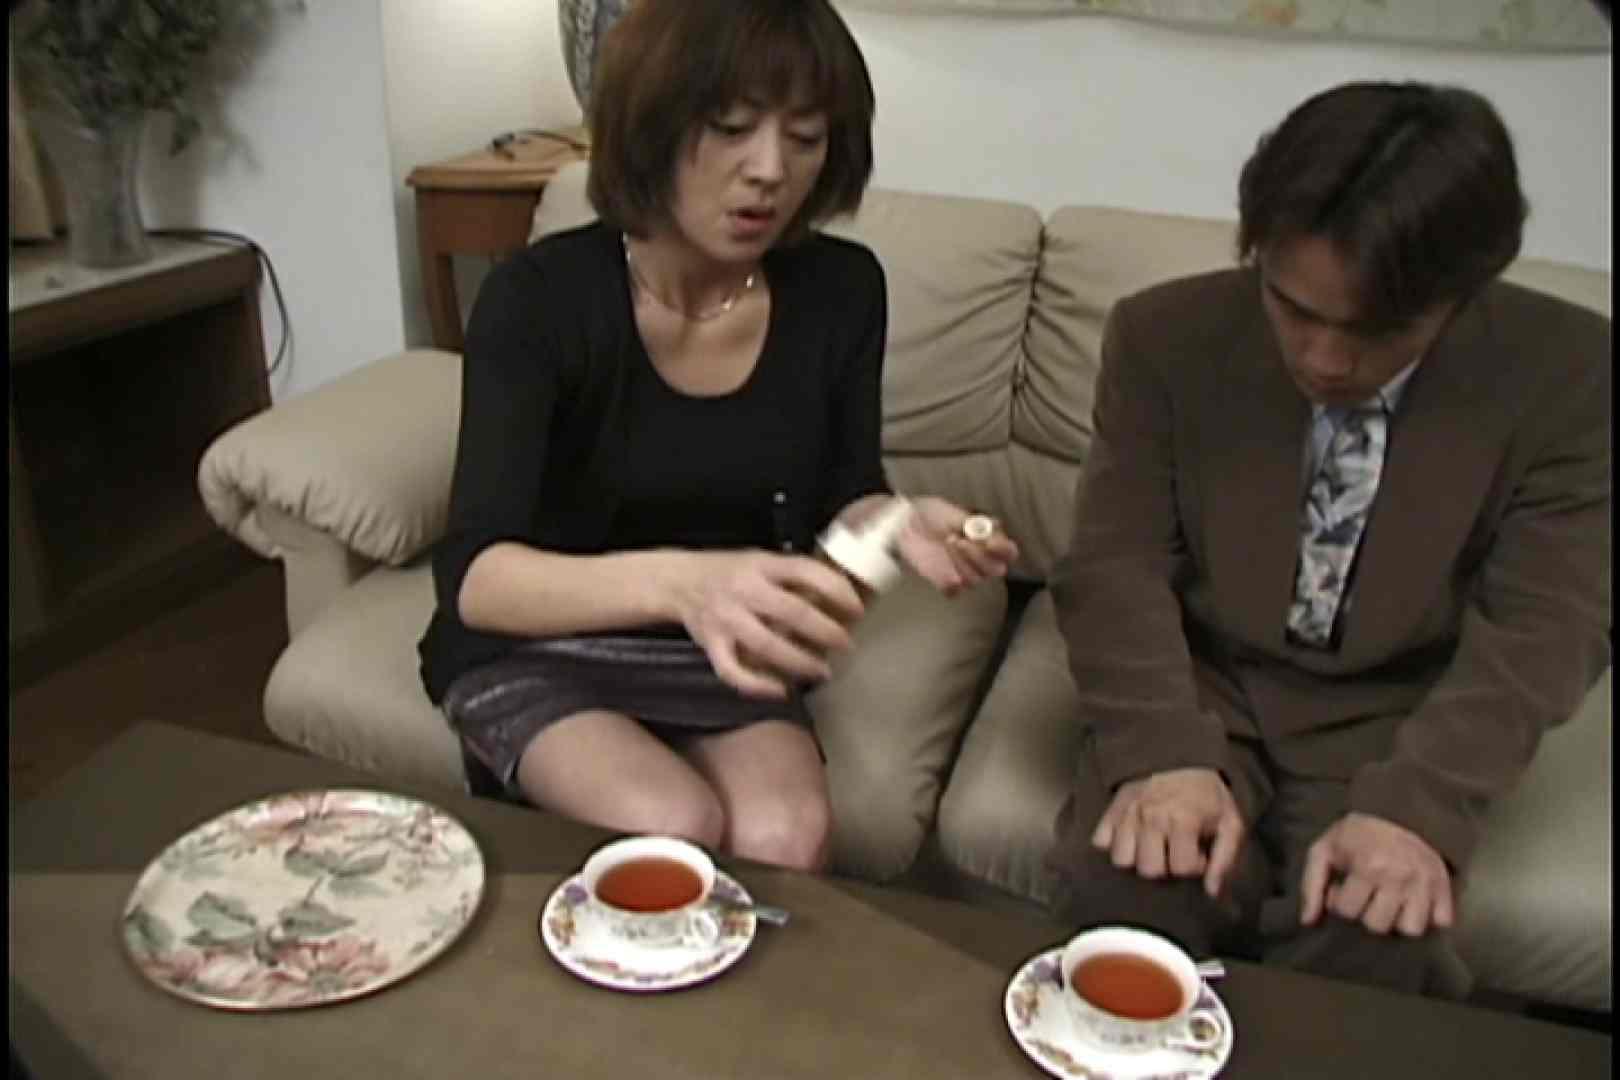 昼間の奥様は欲求不満 ~石川麻紀~ 熟女  69枚 36